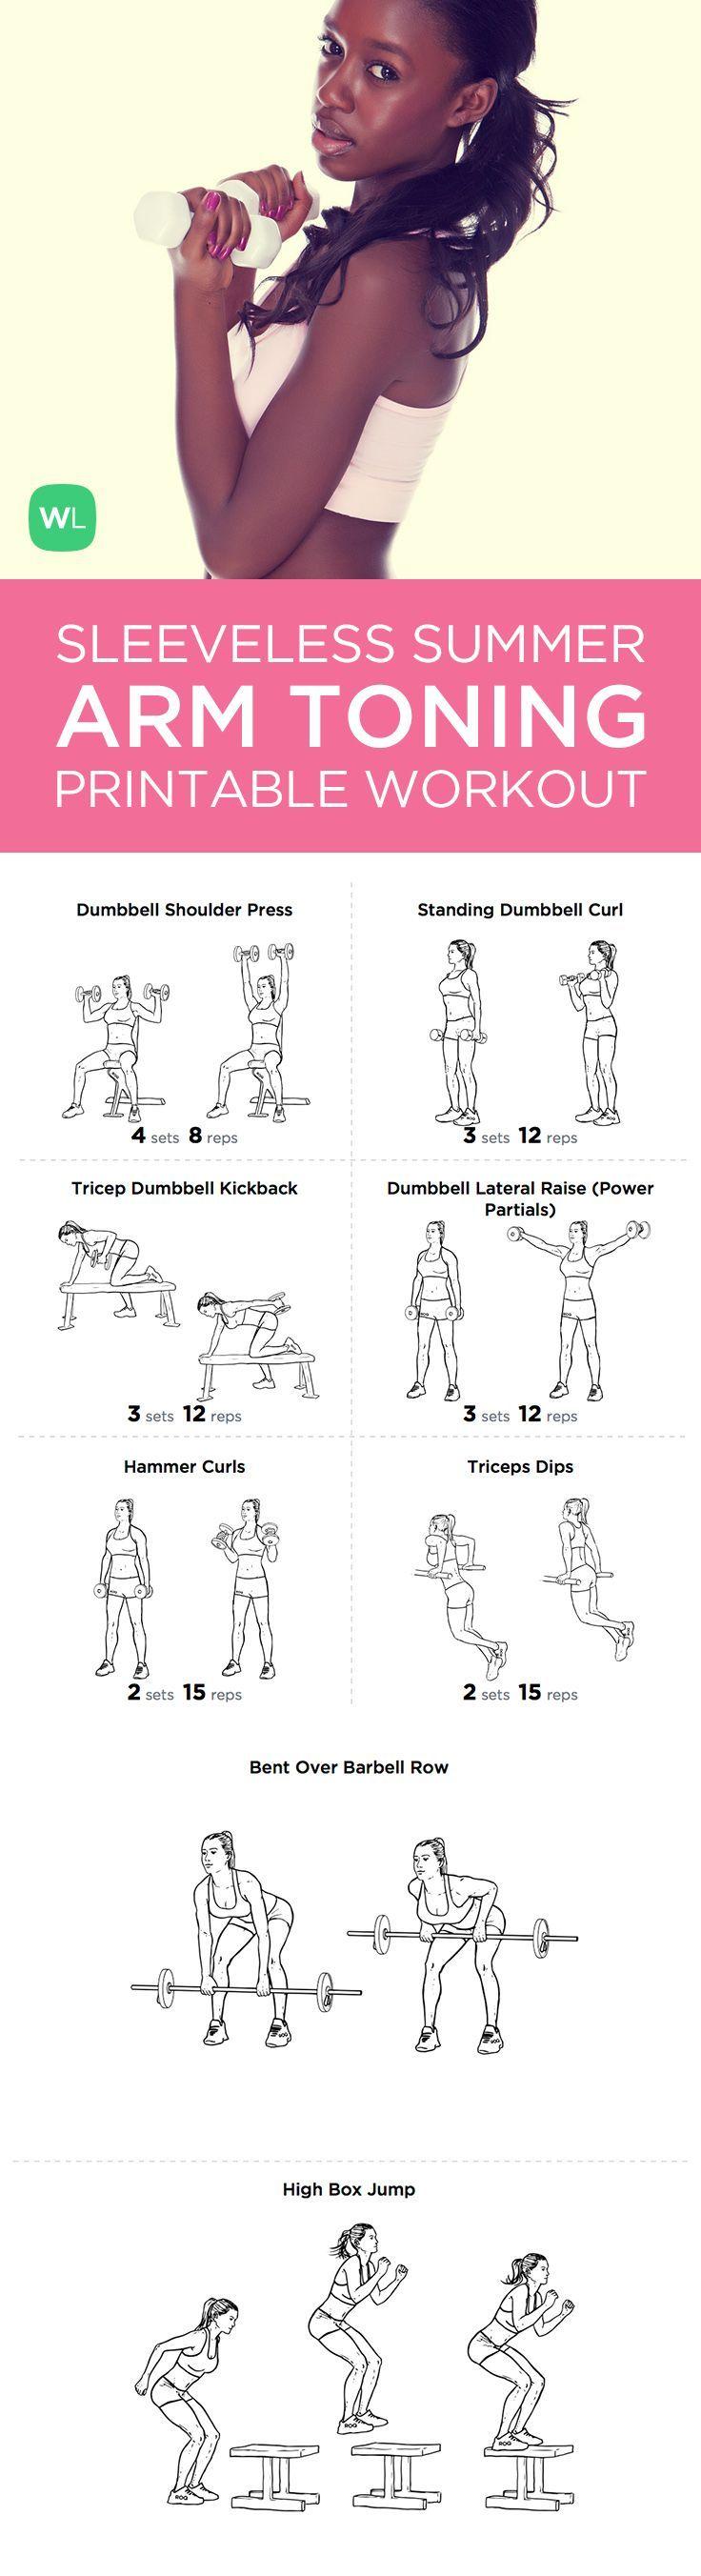 Arm toner workout routine for women fitness pinterest